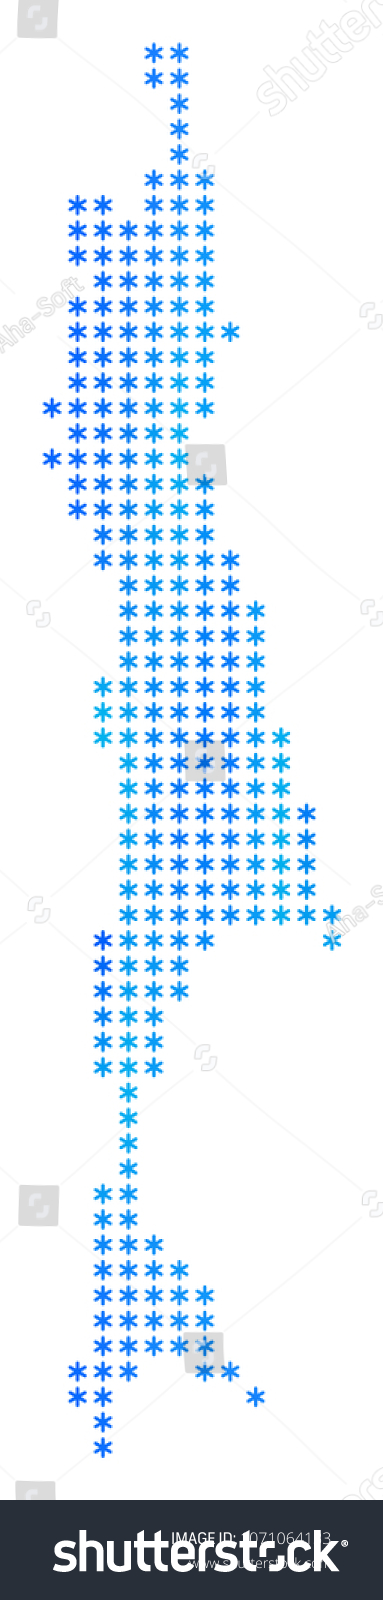 Snowflake Sakhalin Island Map Vector Geographic Stock Vector ...